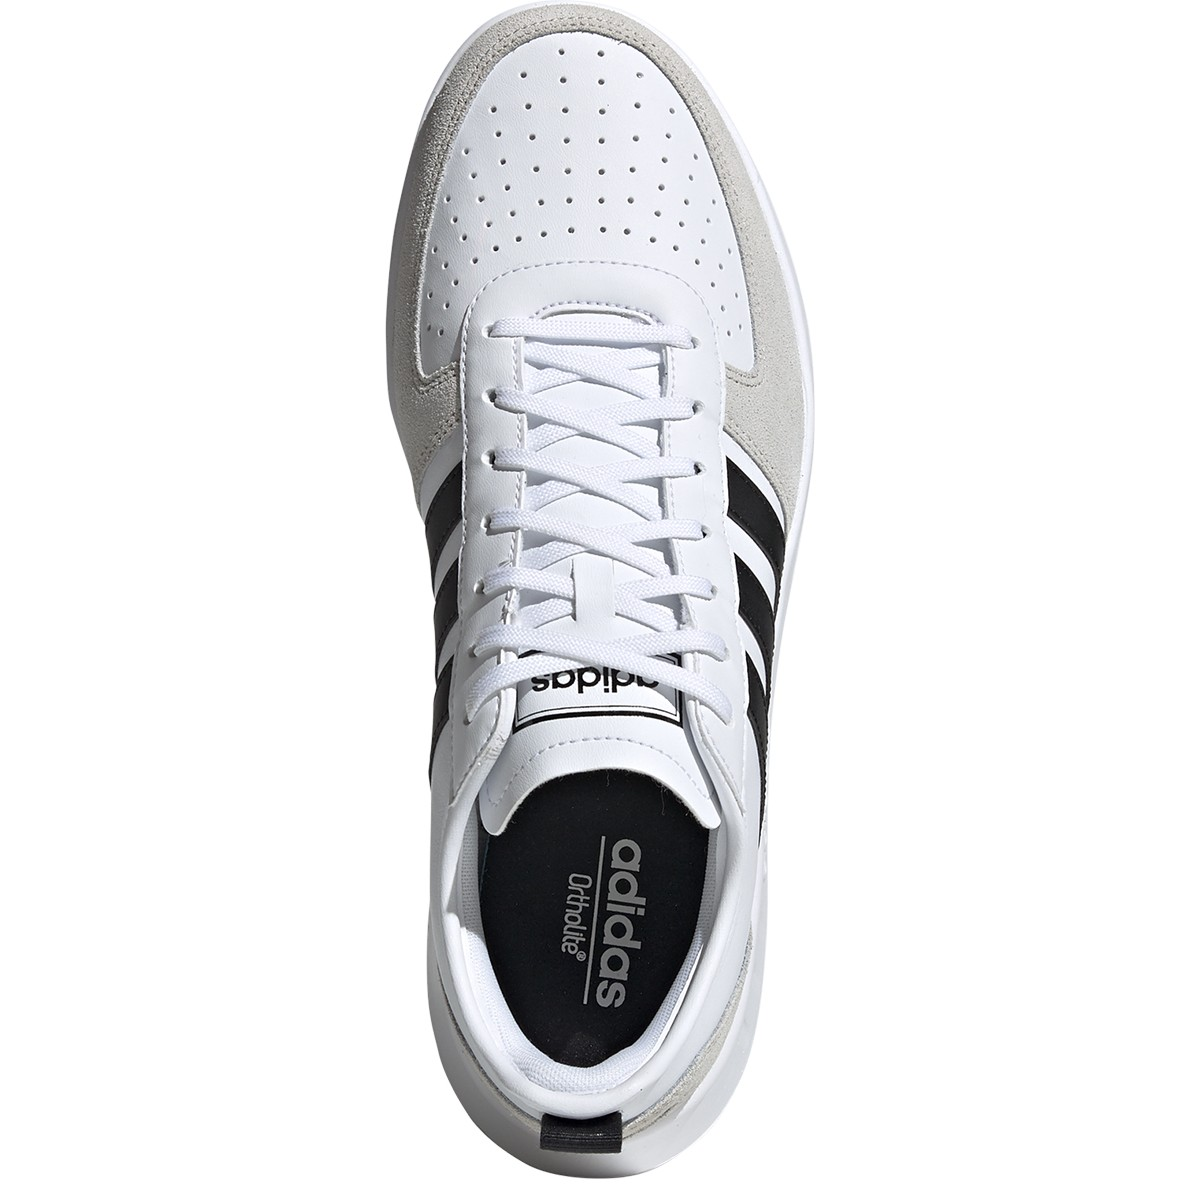 ADIDAS COURT 80S SHOES ADIDAS Men's Shoes Tennispro  Tennispro